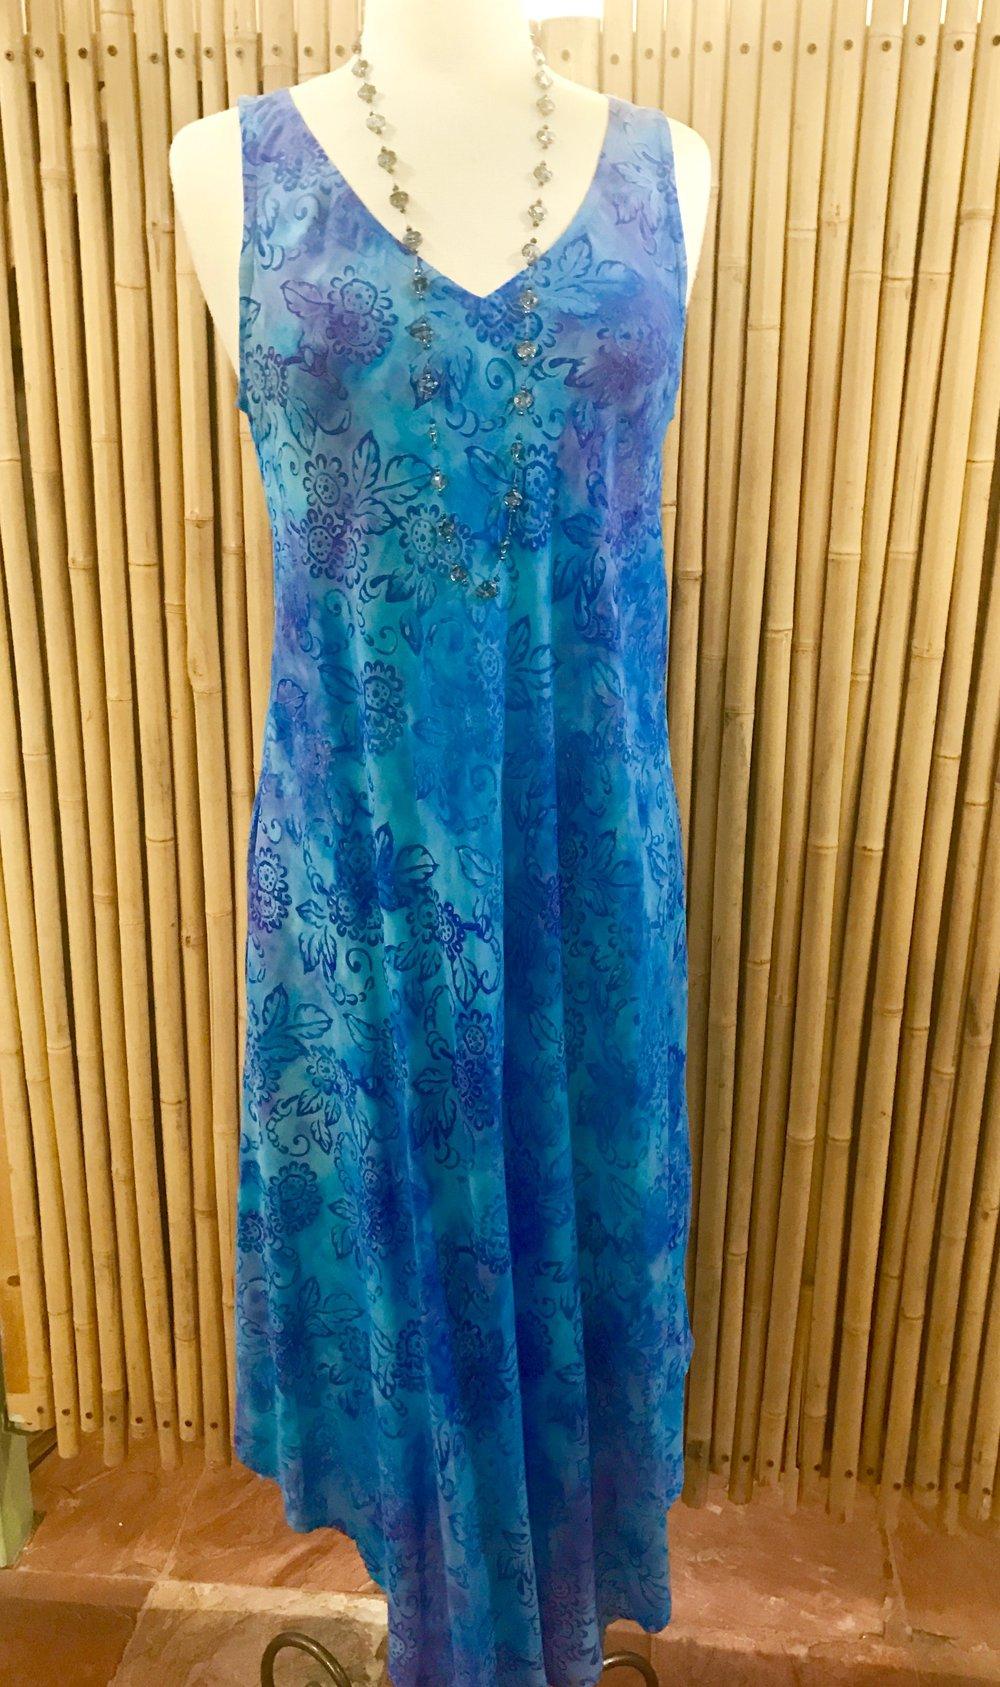 Batik dress by Oceania